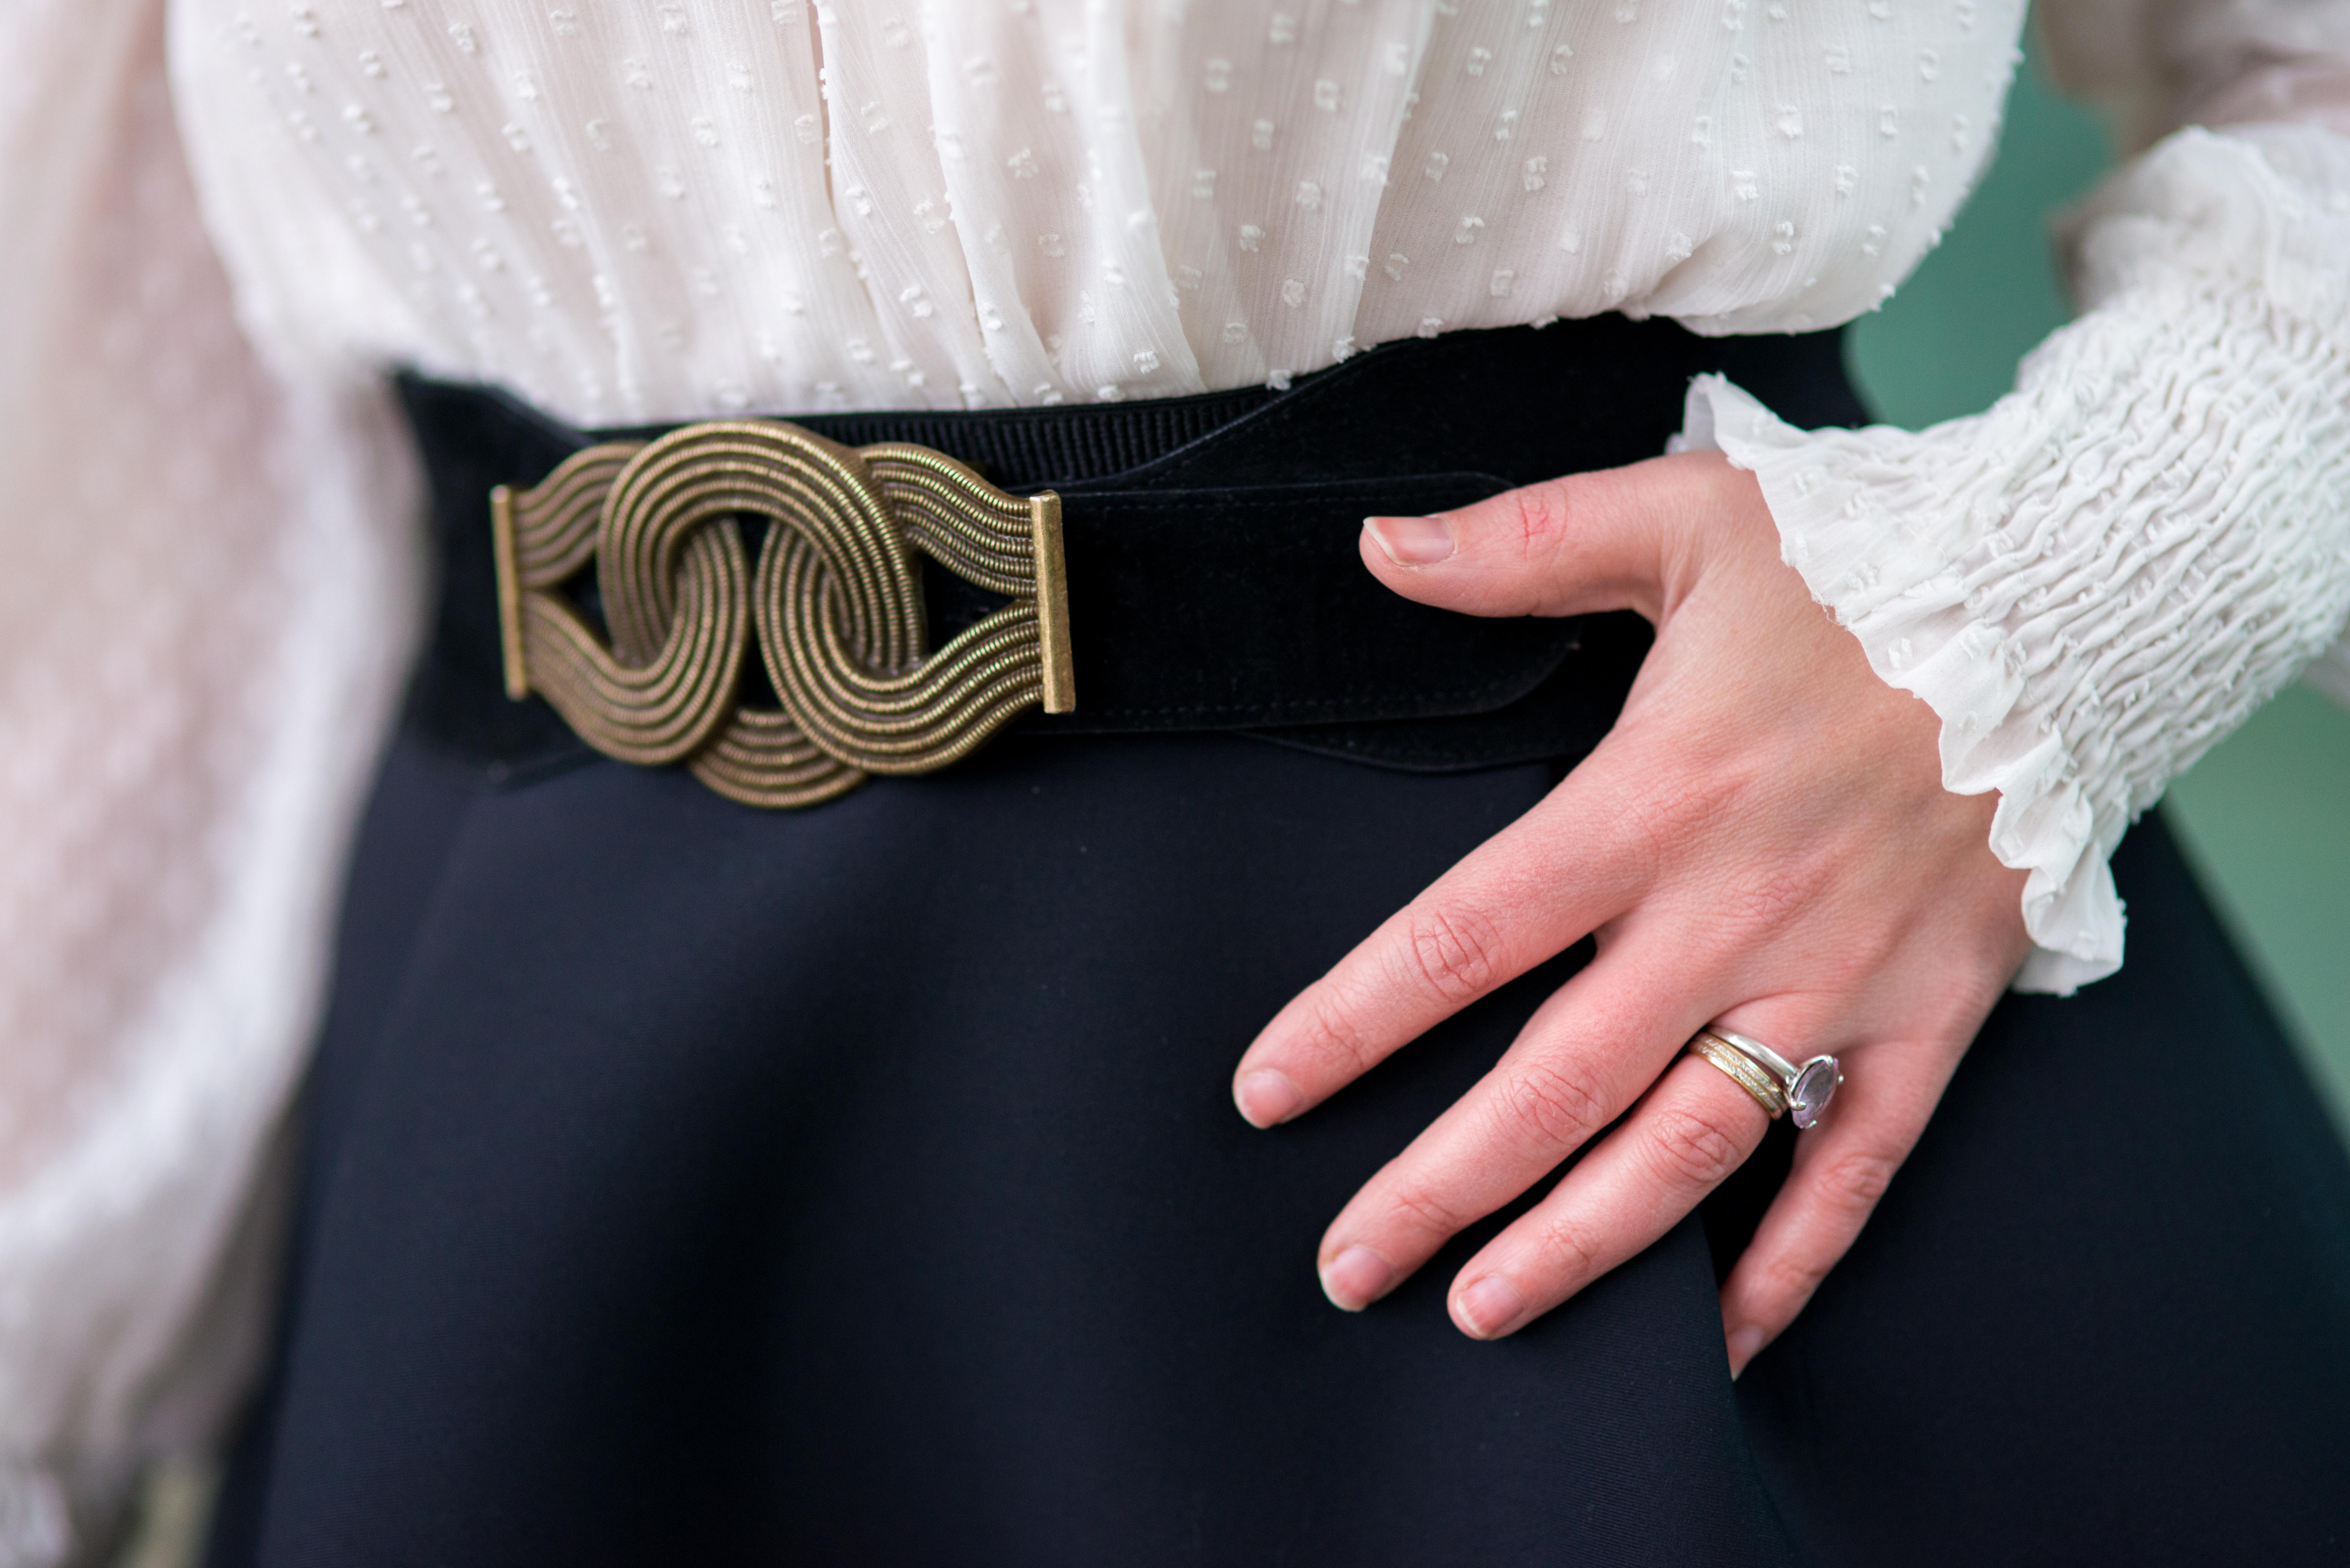 style-sophistique-modele-grandearche-ladefense-paris-fashionblogger-influencer-blouse-zara-seralynepointcom-ump_6773